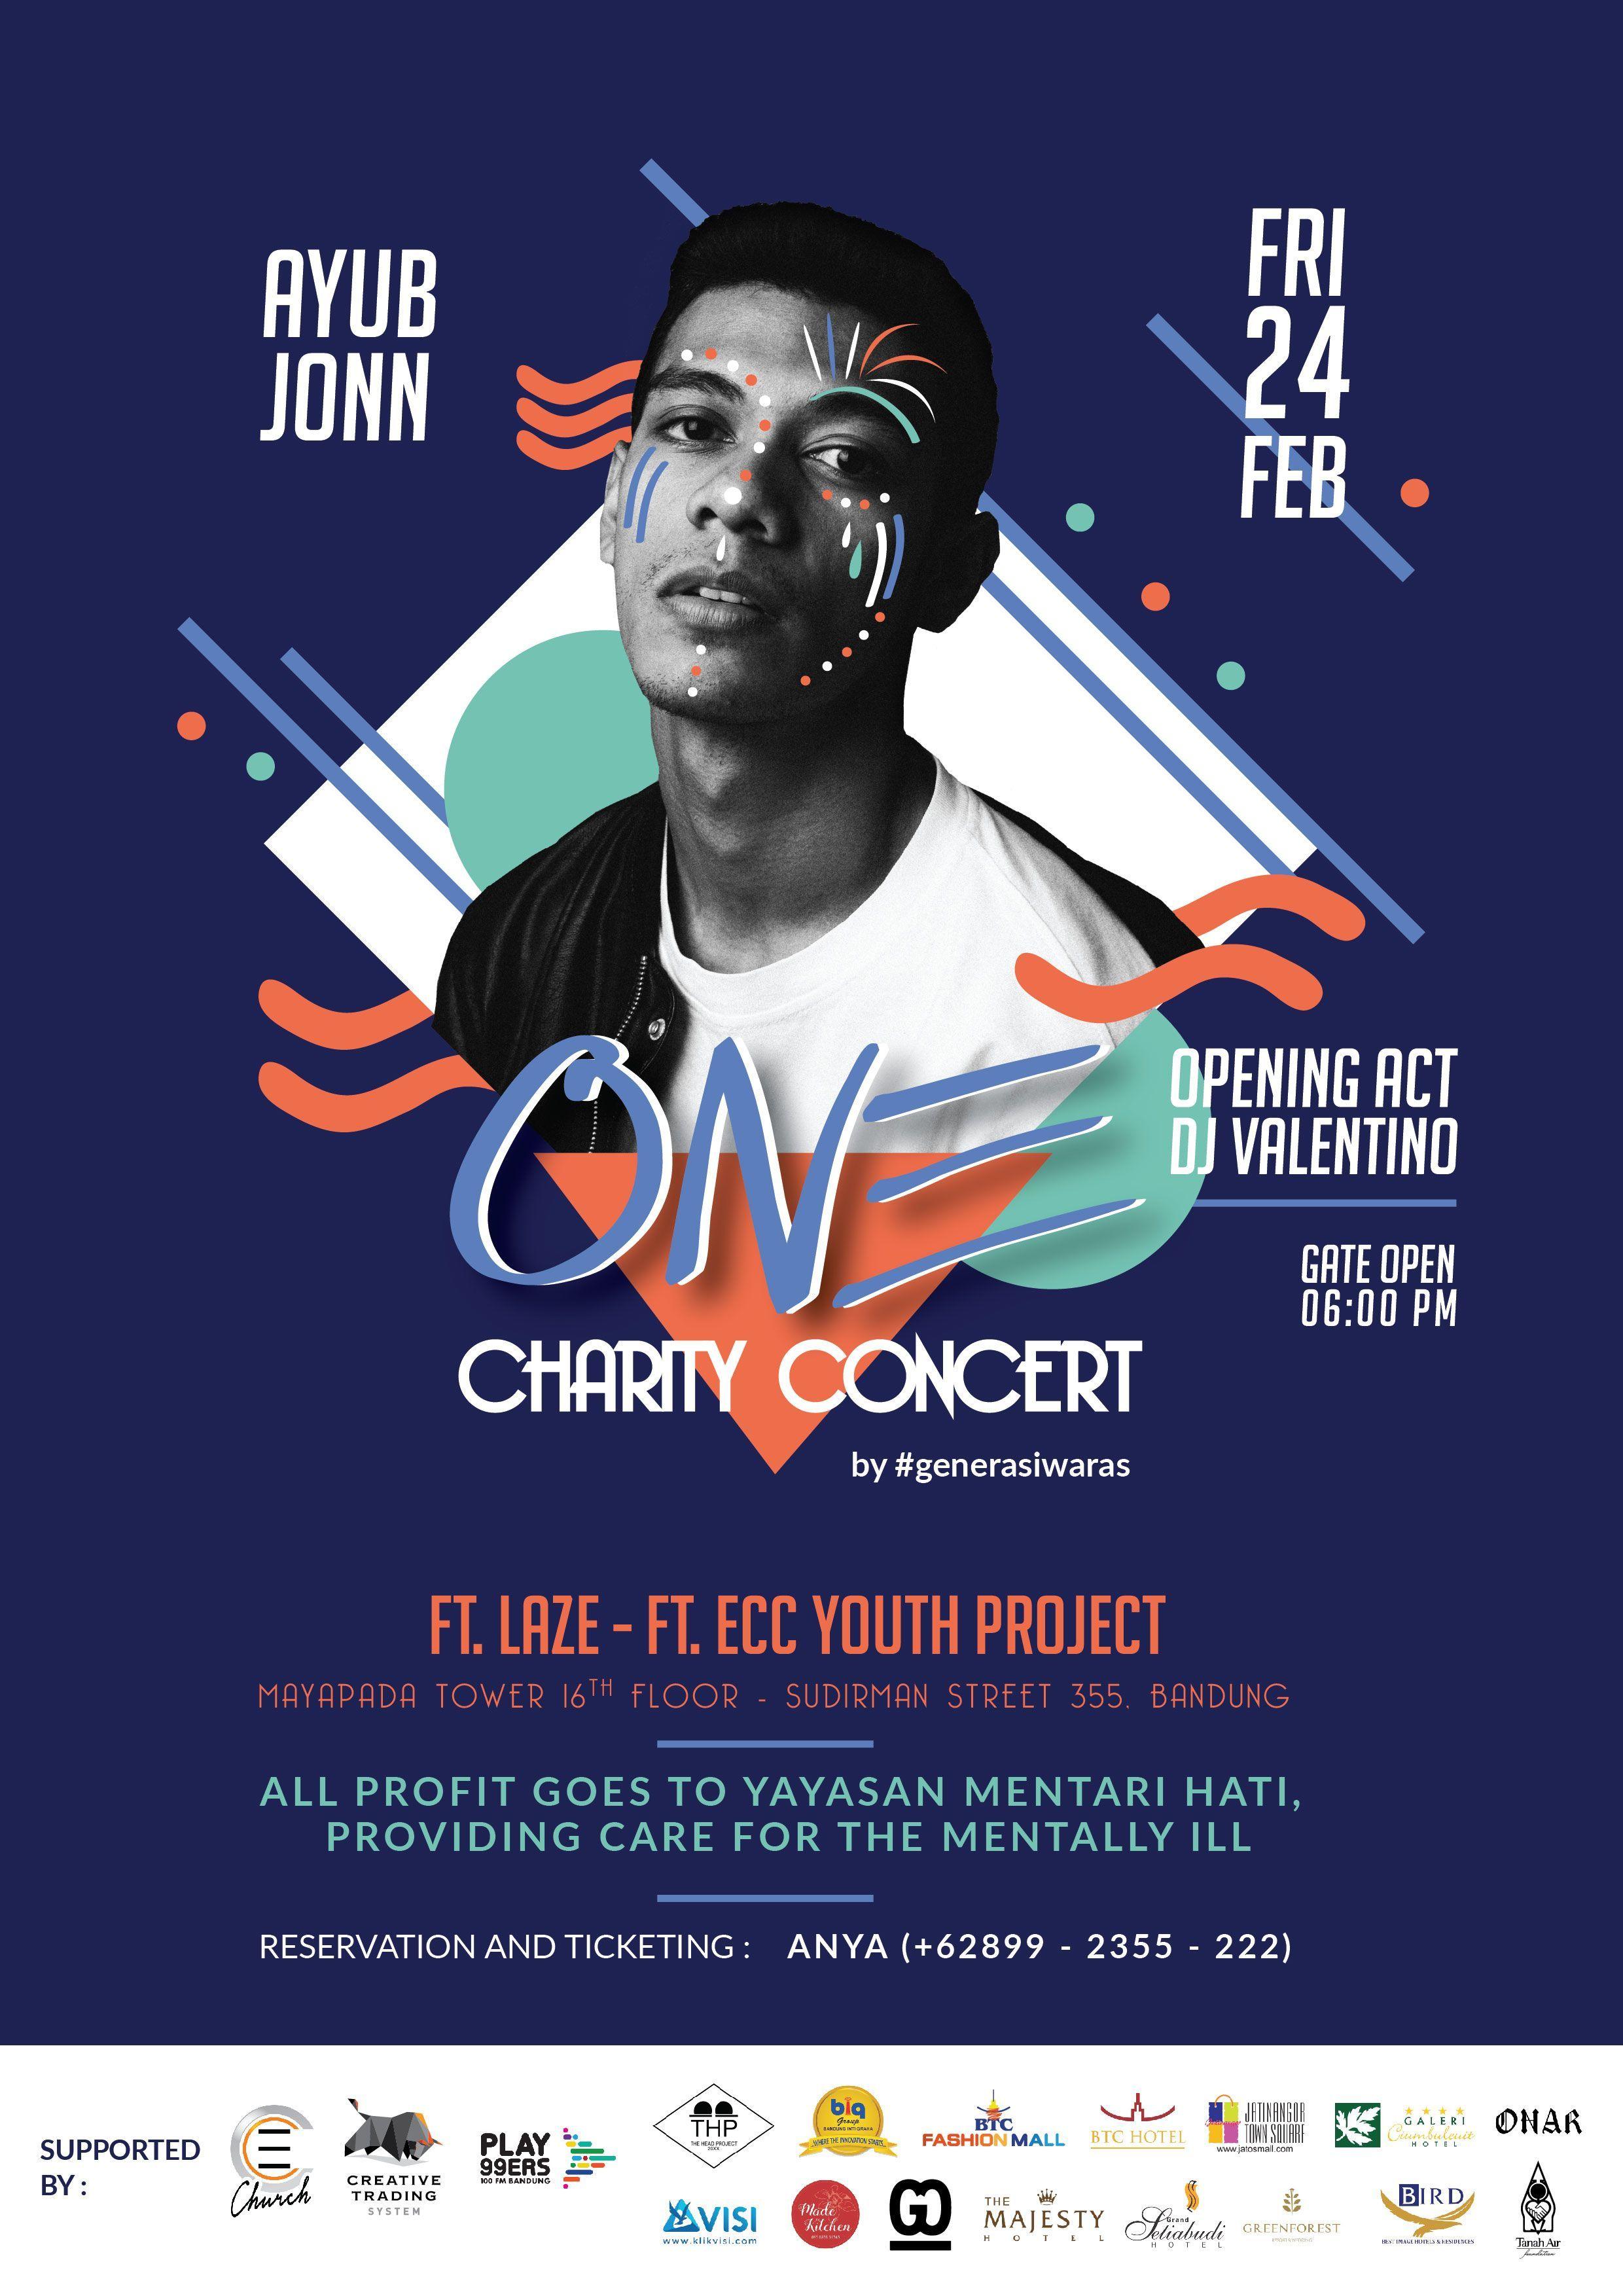 One Charity Concert Ayub Jonn Ft Laze Event Poster Design Layout Concert Poster Design Event Poster Design Event Poster Design Layout